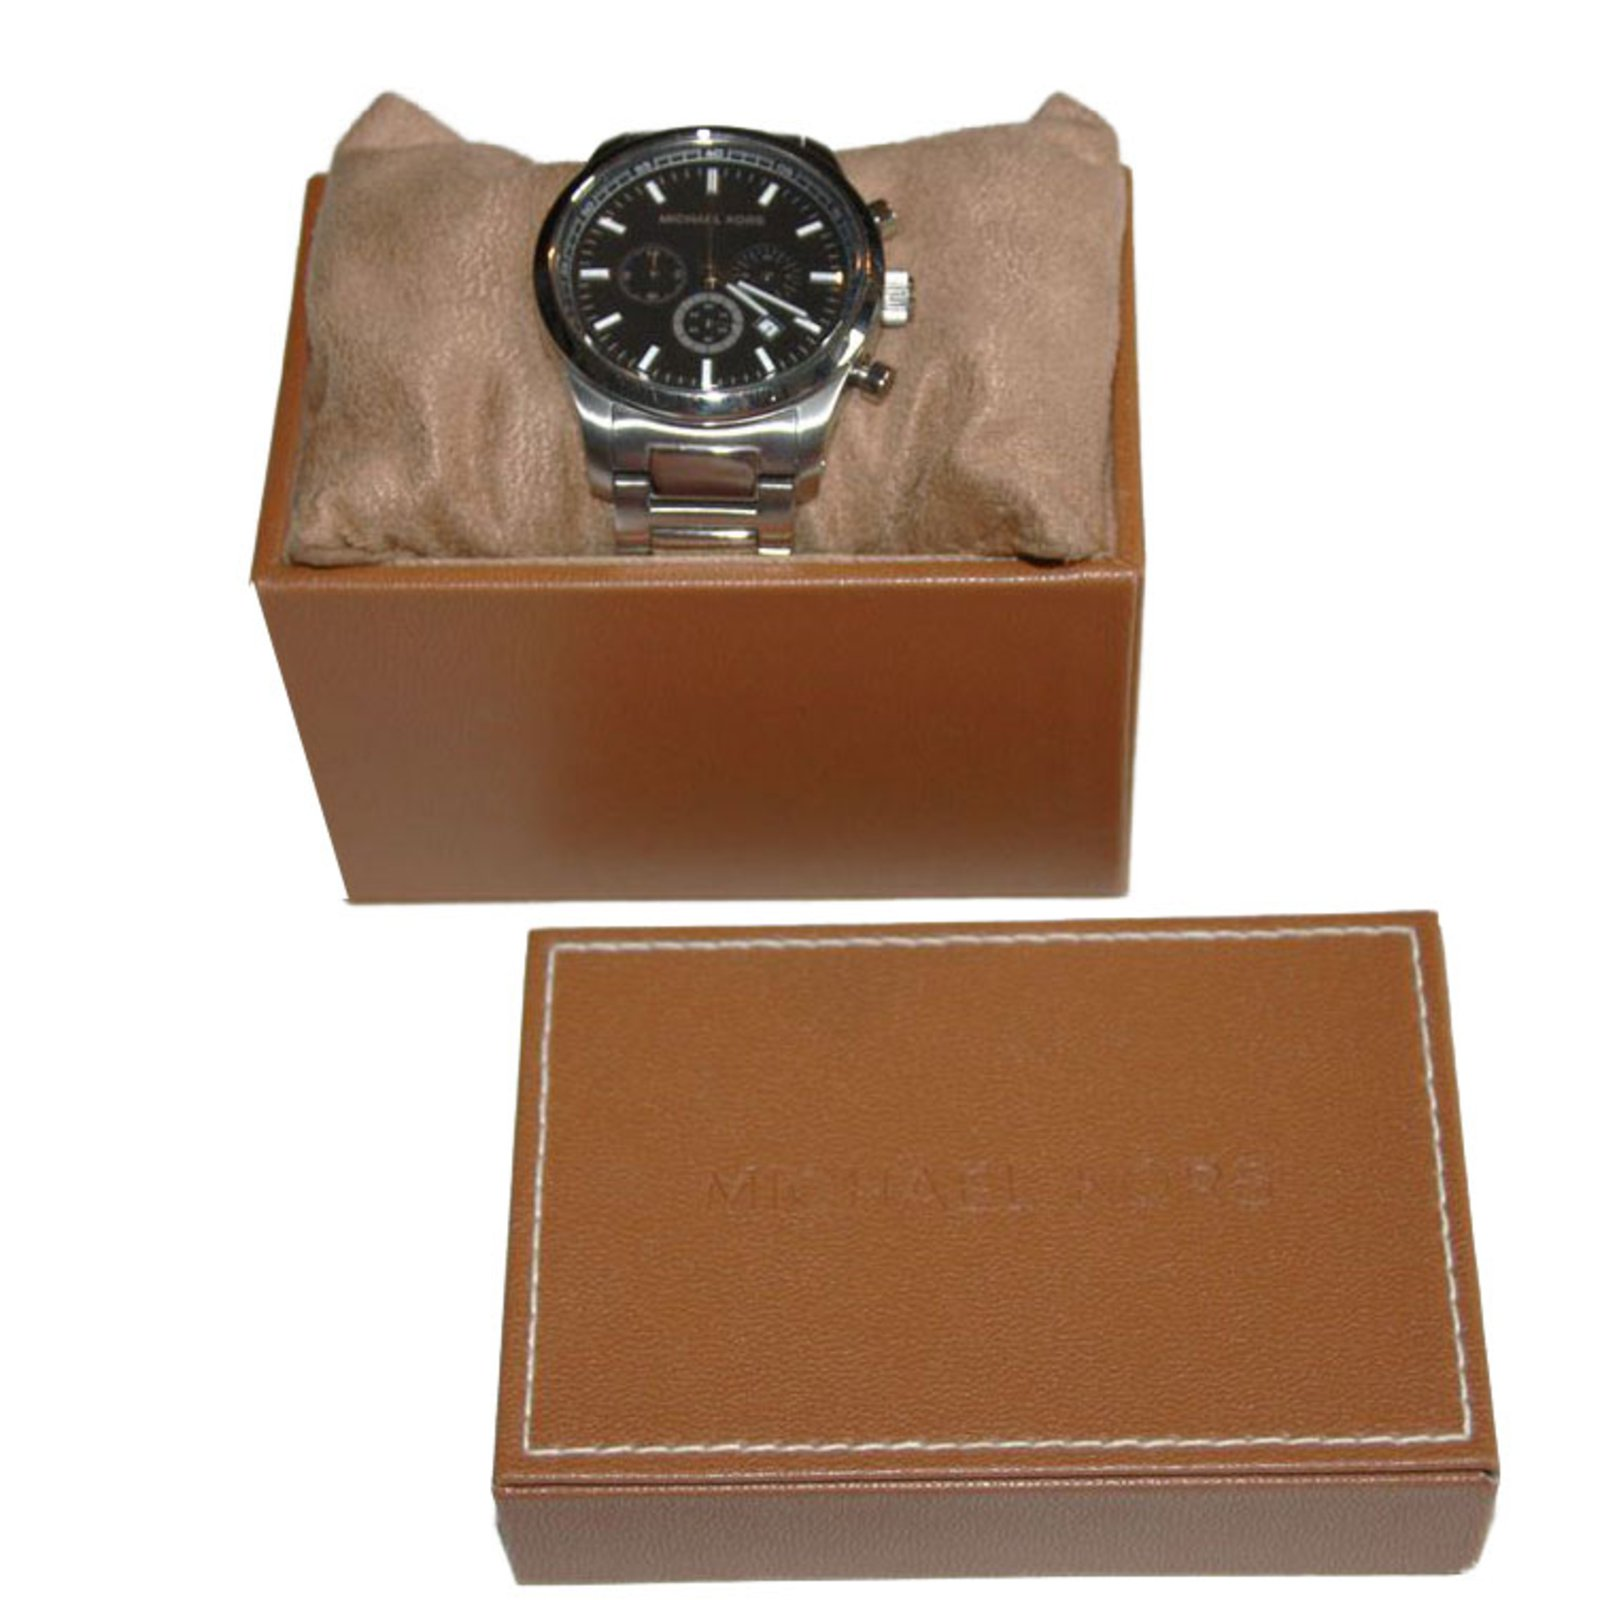 d8d6a4d05518 Michael Kors Quartz Watches Quartz Watches Other Other ref.64307 ...